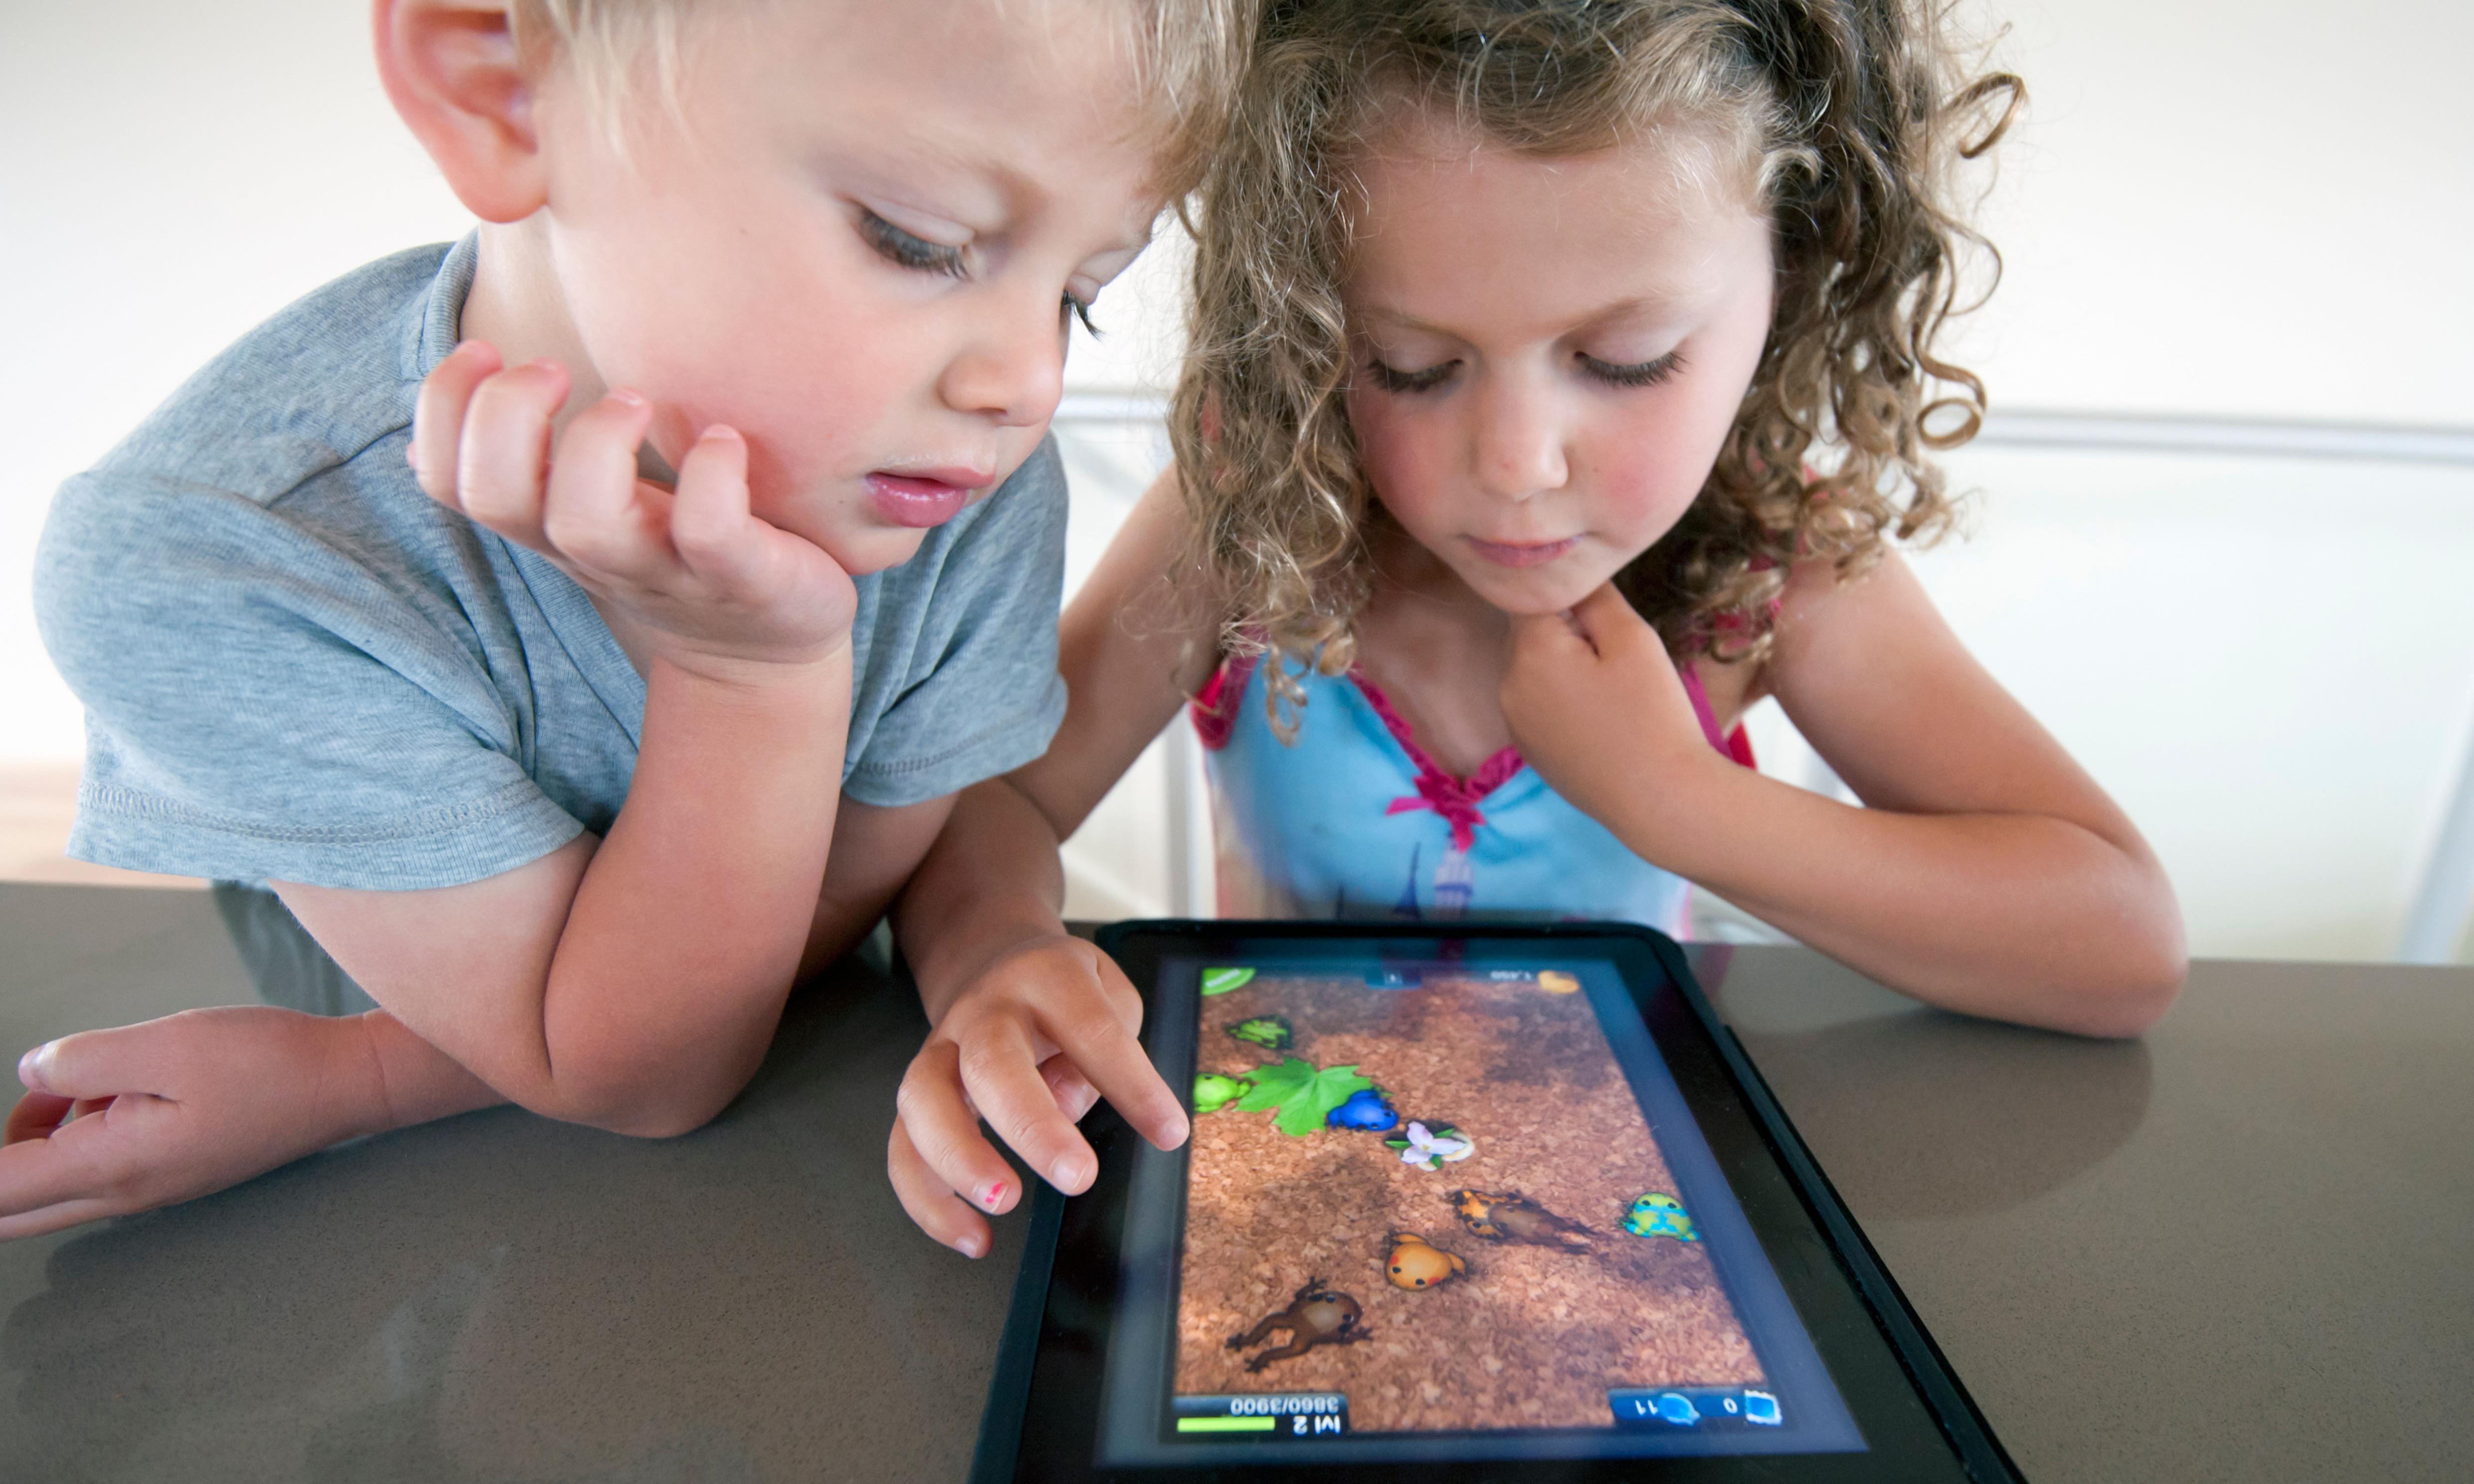 Safe gaming: 21 family-friendly apps for children